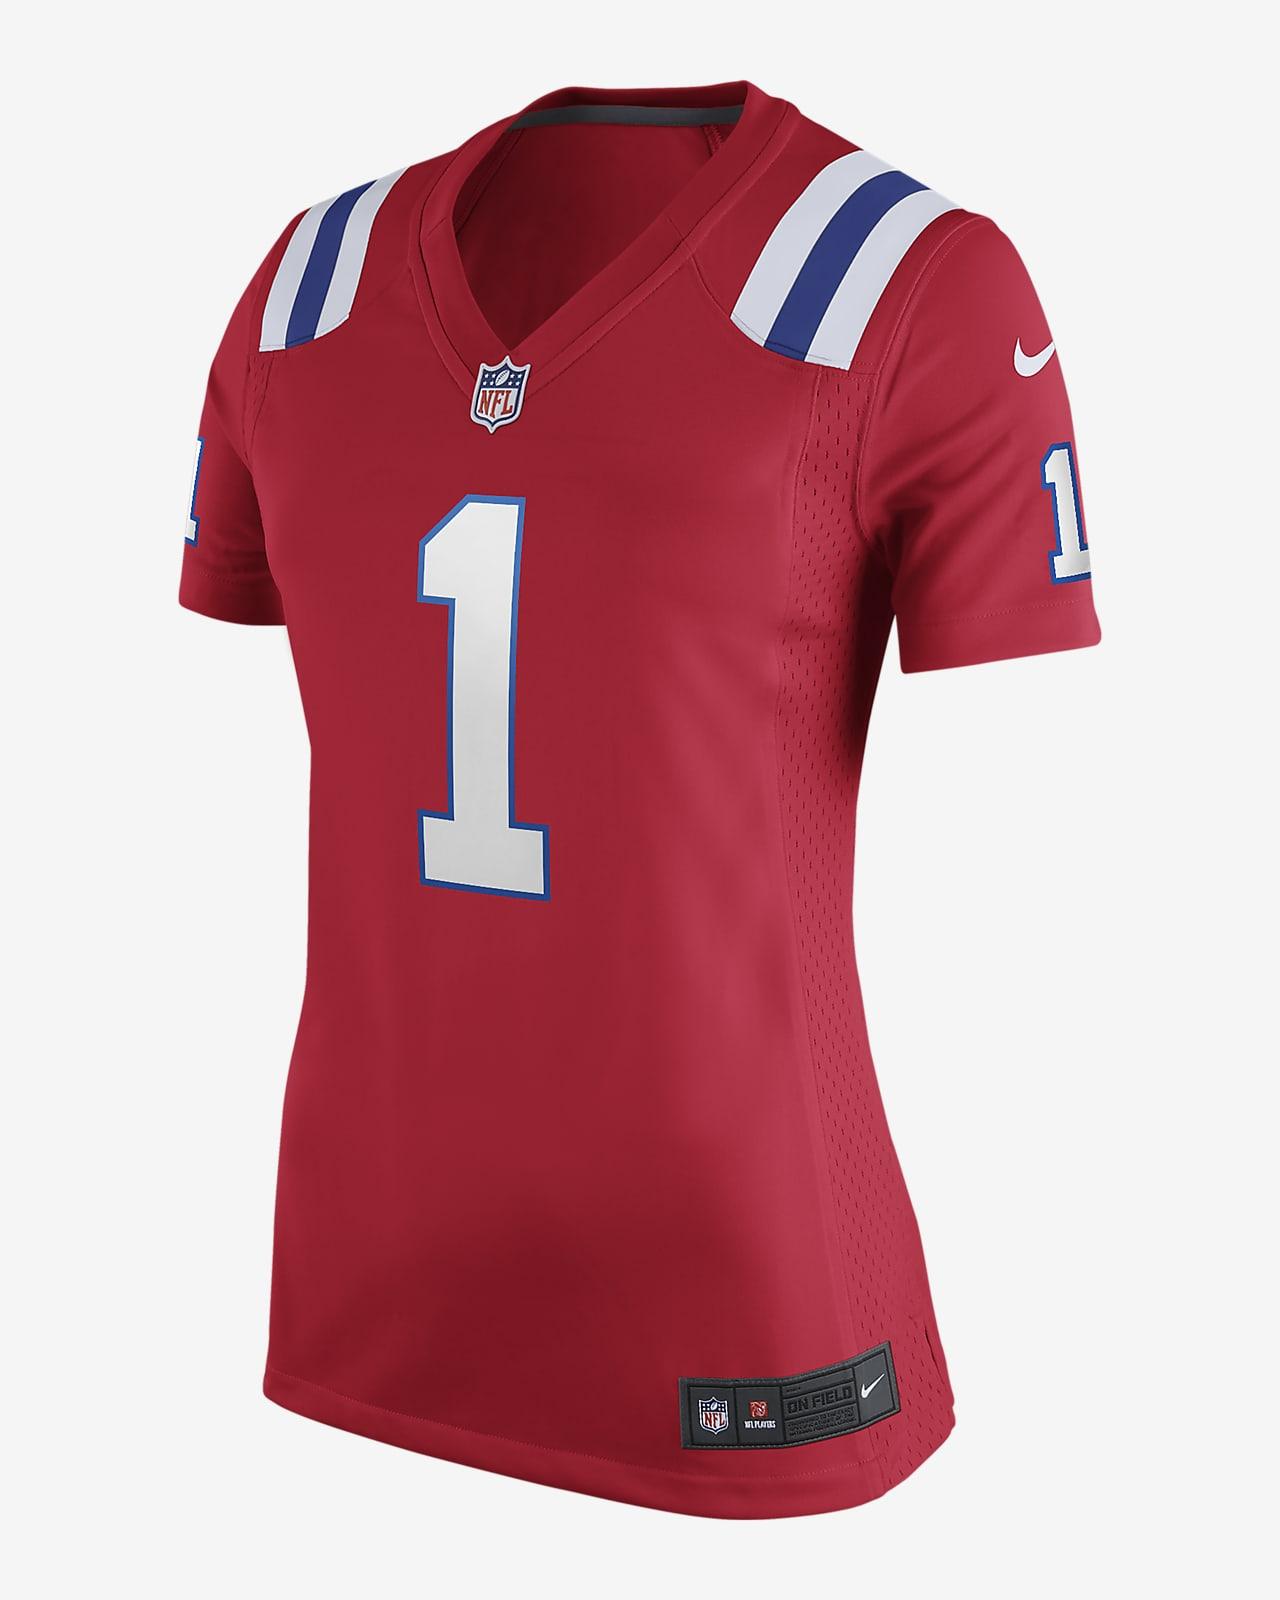 NFL New England Patriots (Cam Newton) Women's Game Football Jersey